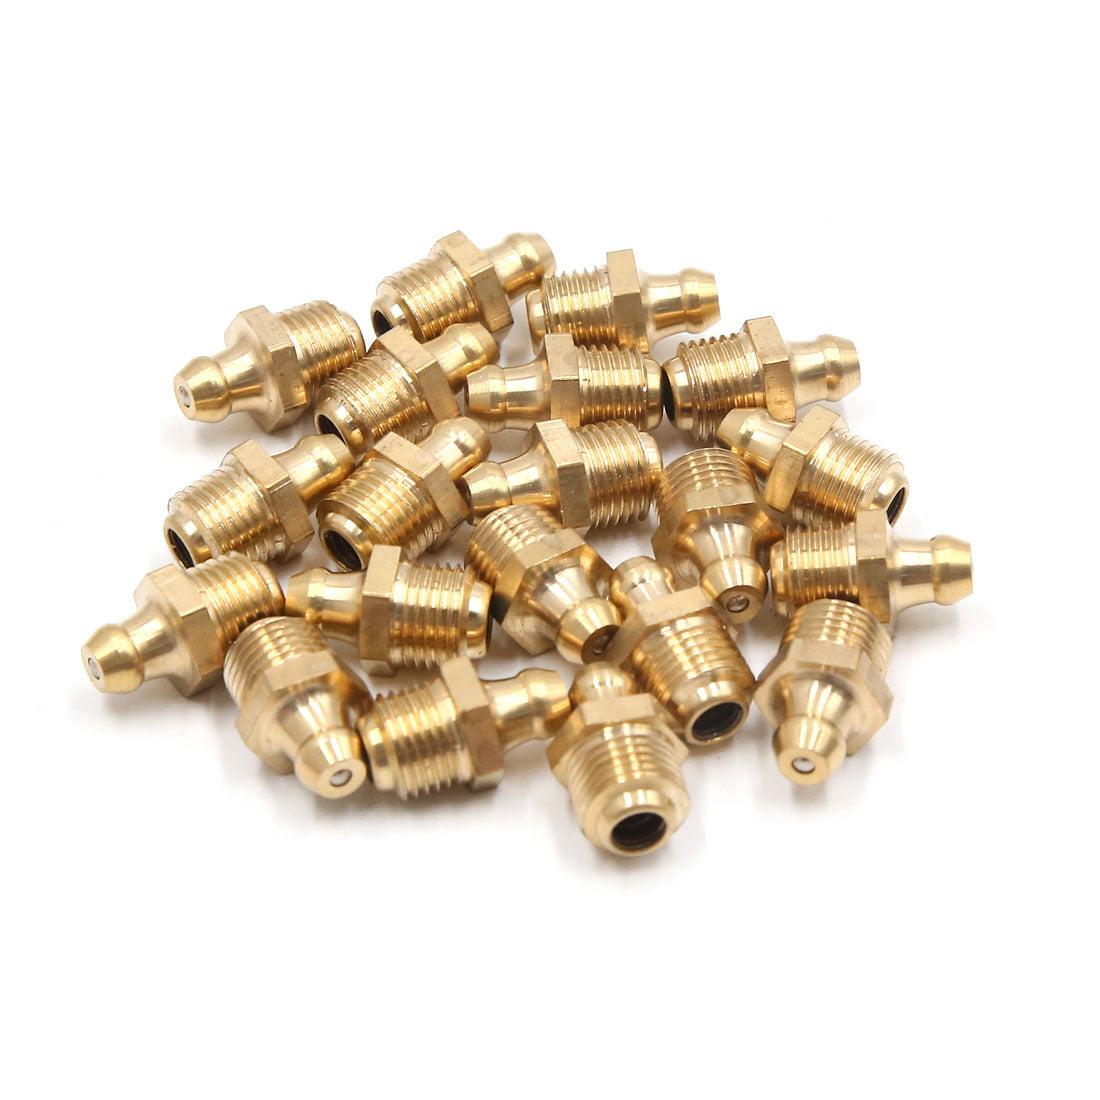 20Pcs M10 x 1 Thread Brass Straight Grease Zerk Nipple Fitting for Auto Car